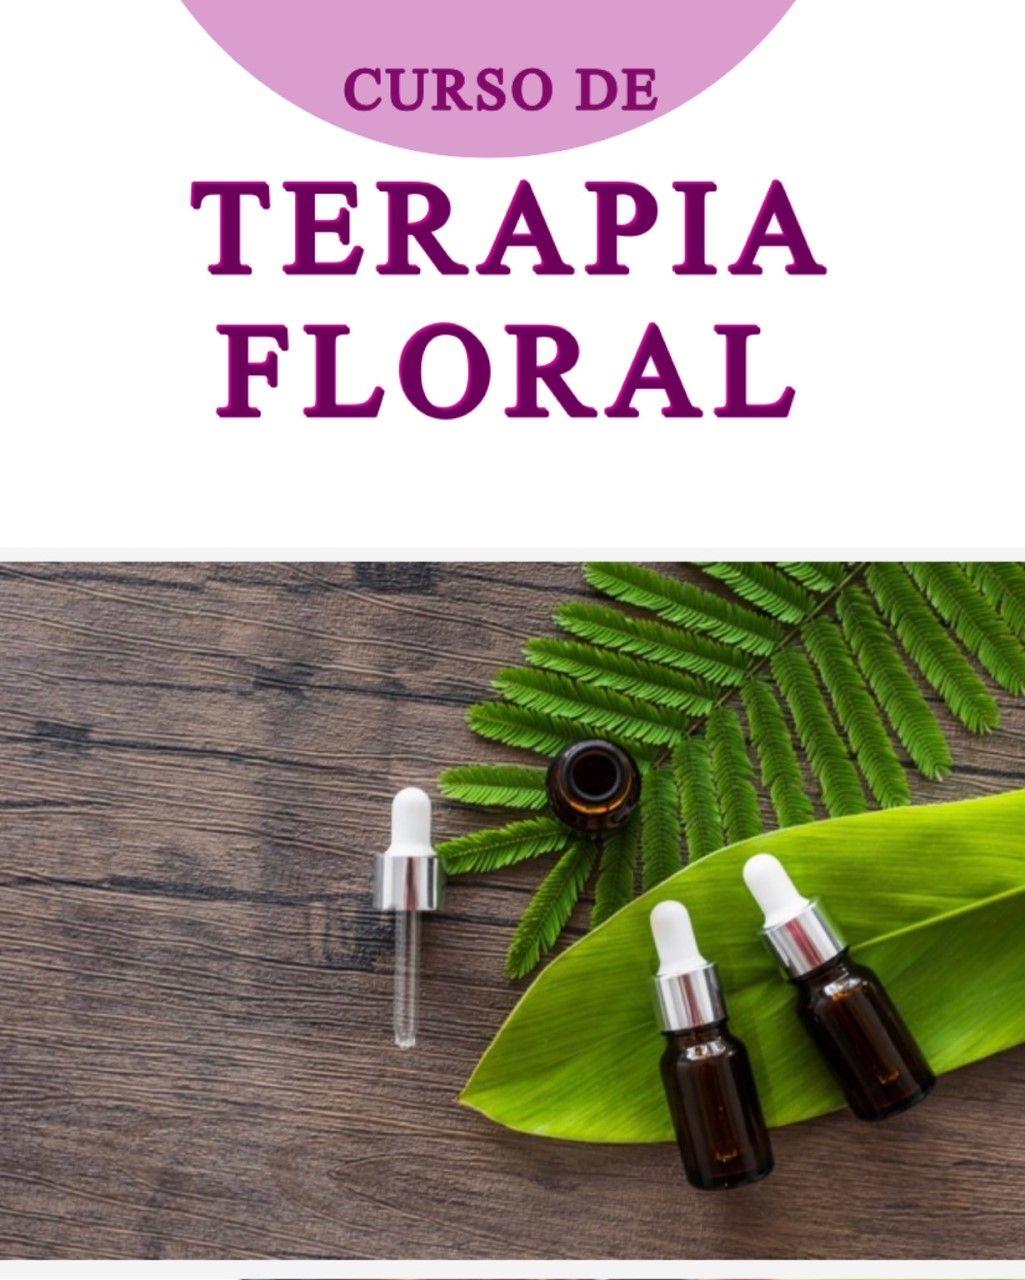 Curso de Terapia Floral